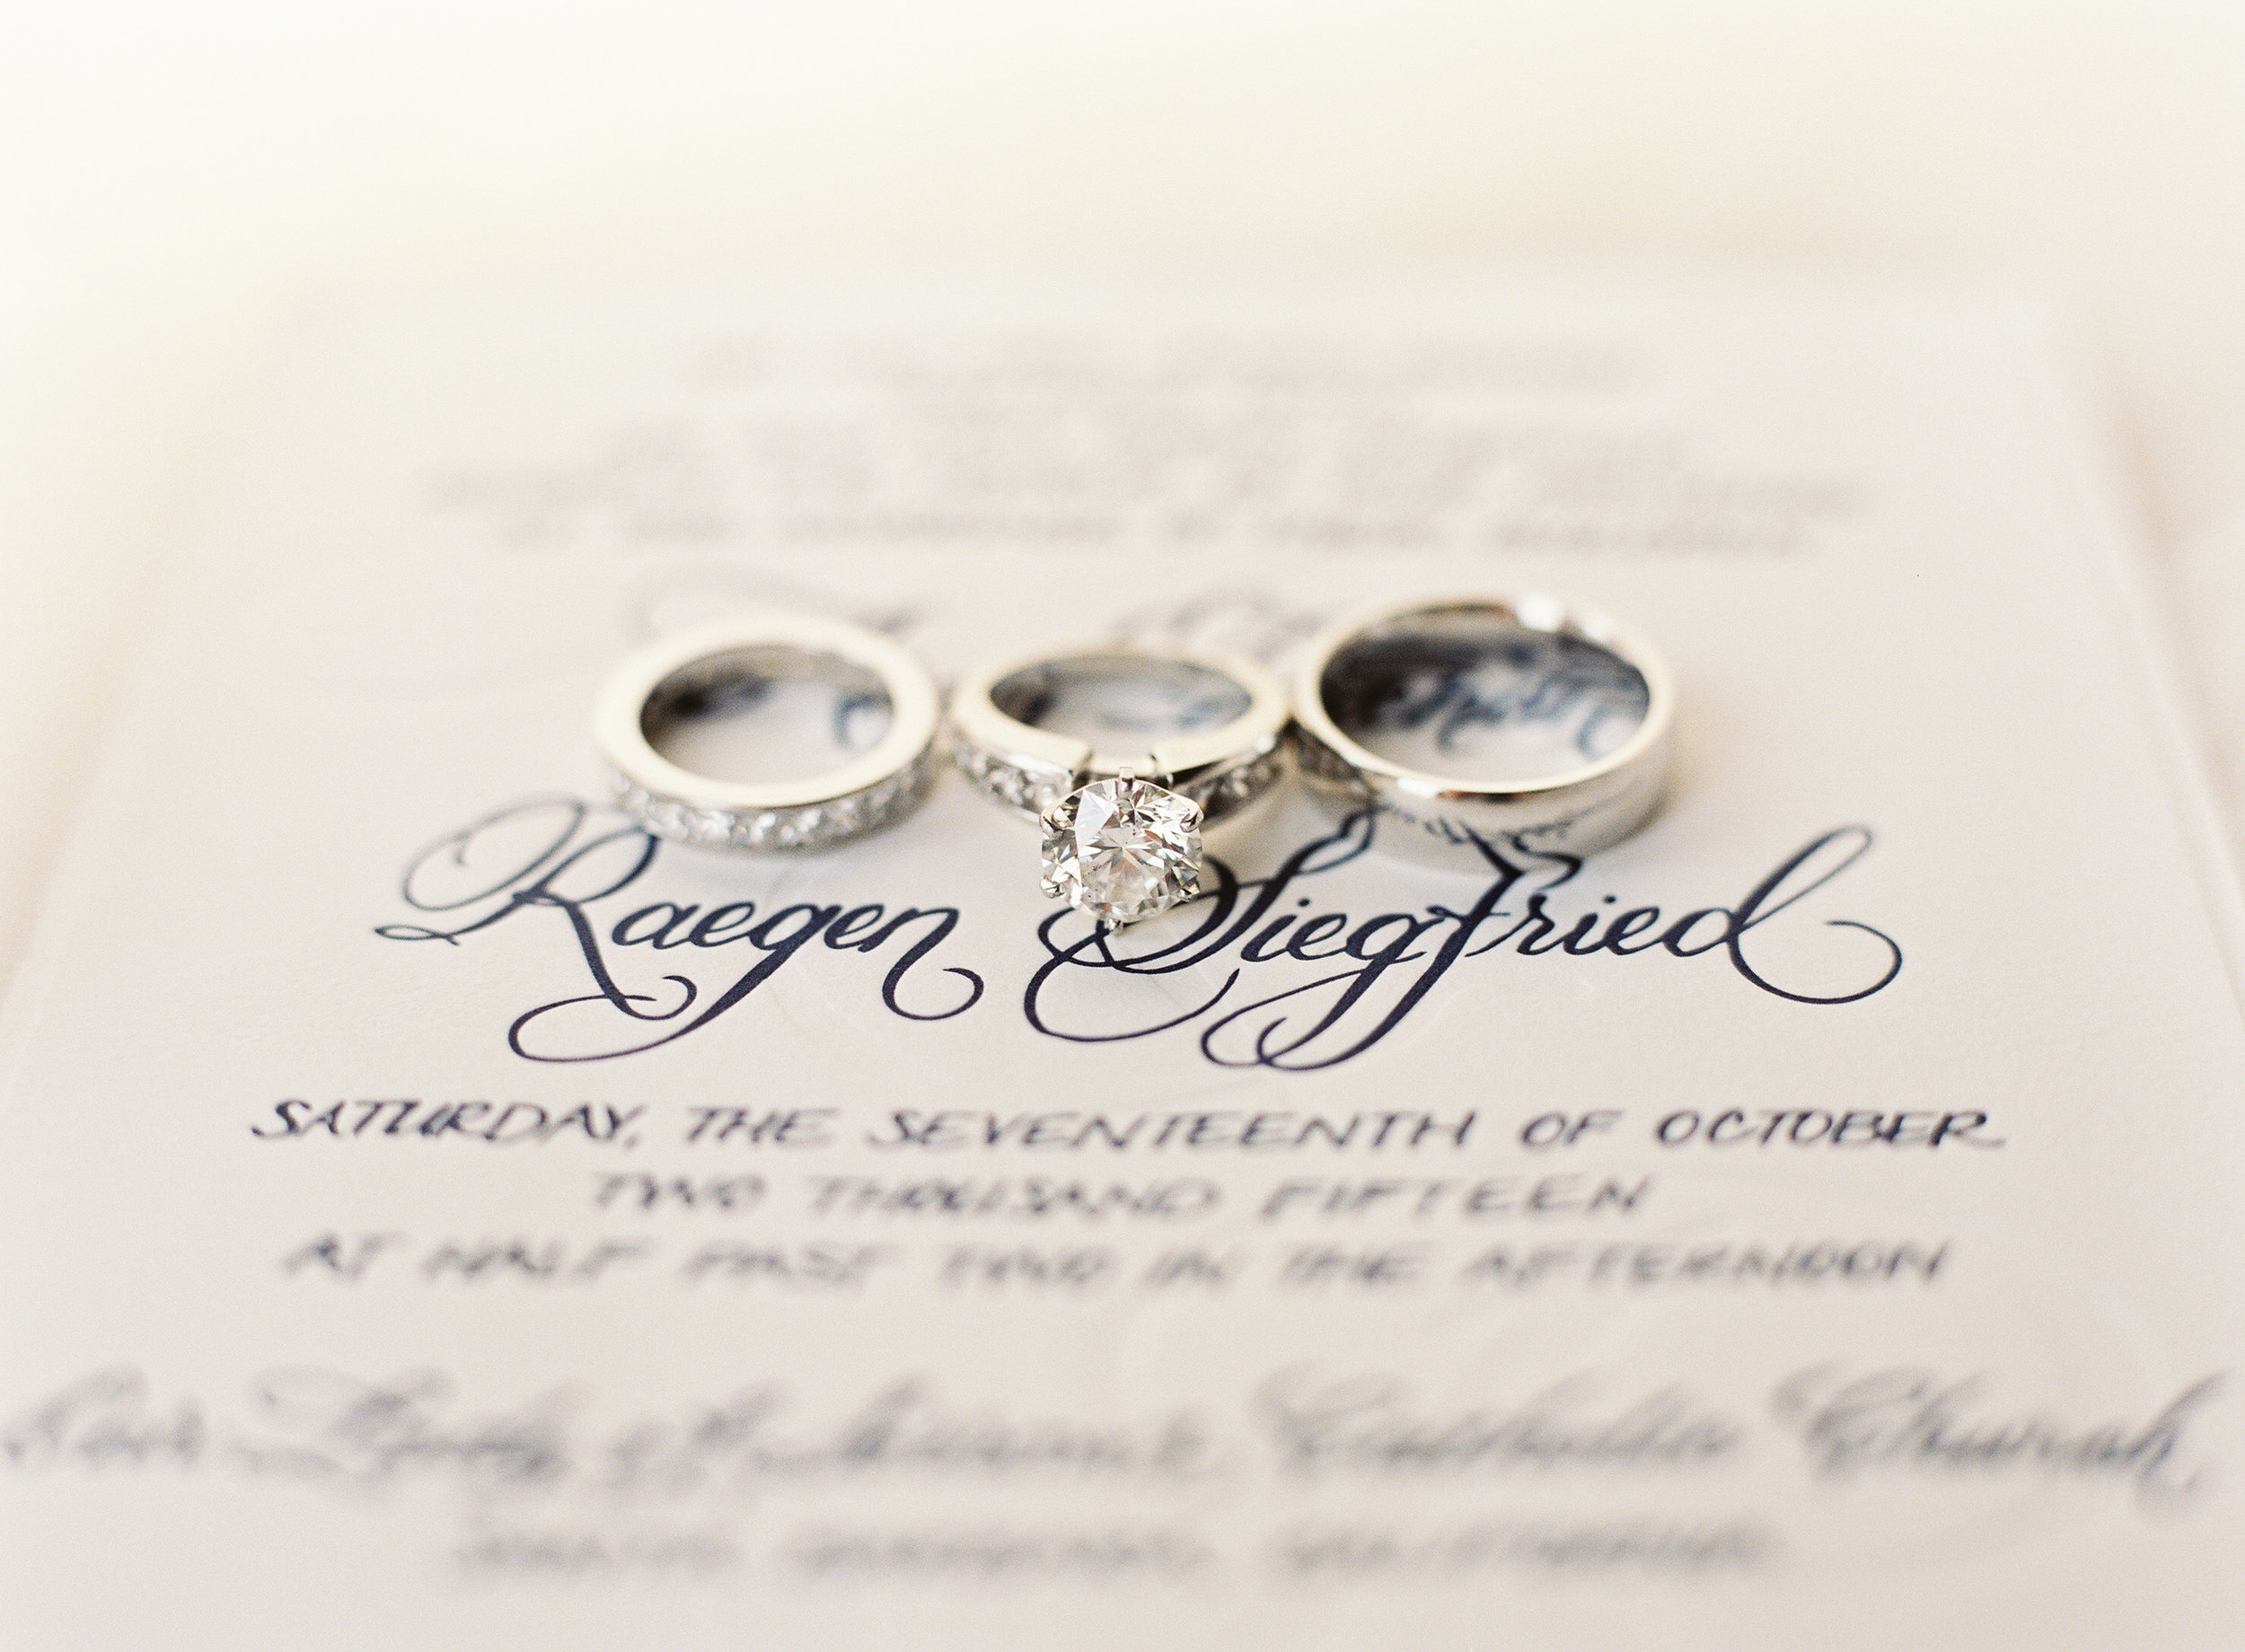 www.santabarbarawedding.com   Linda Chaja Photography   Santa Barbara Museum of Natural History Sea Center   Wedding Rings